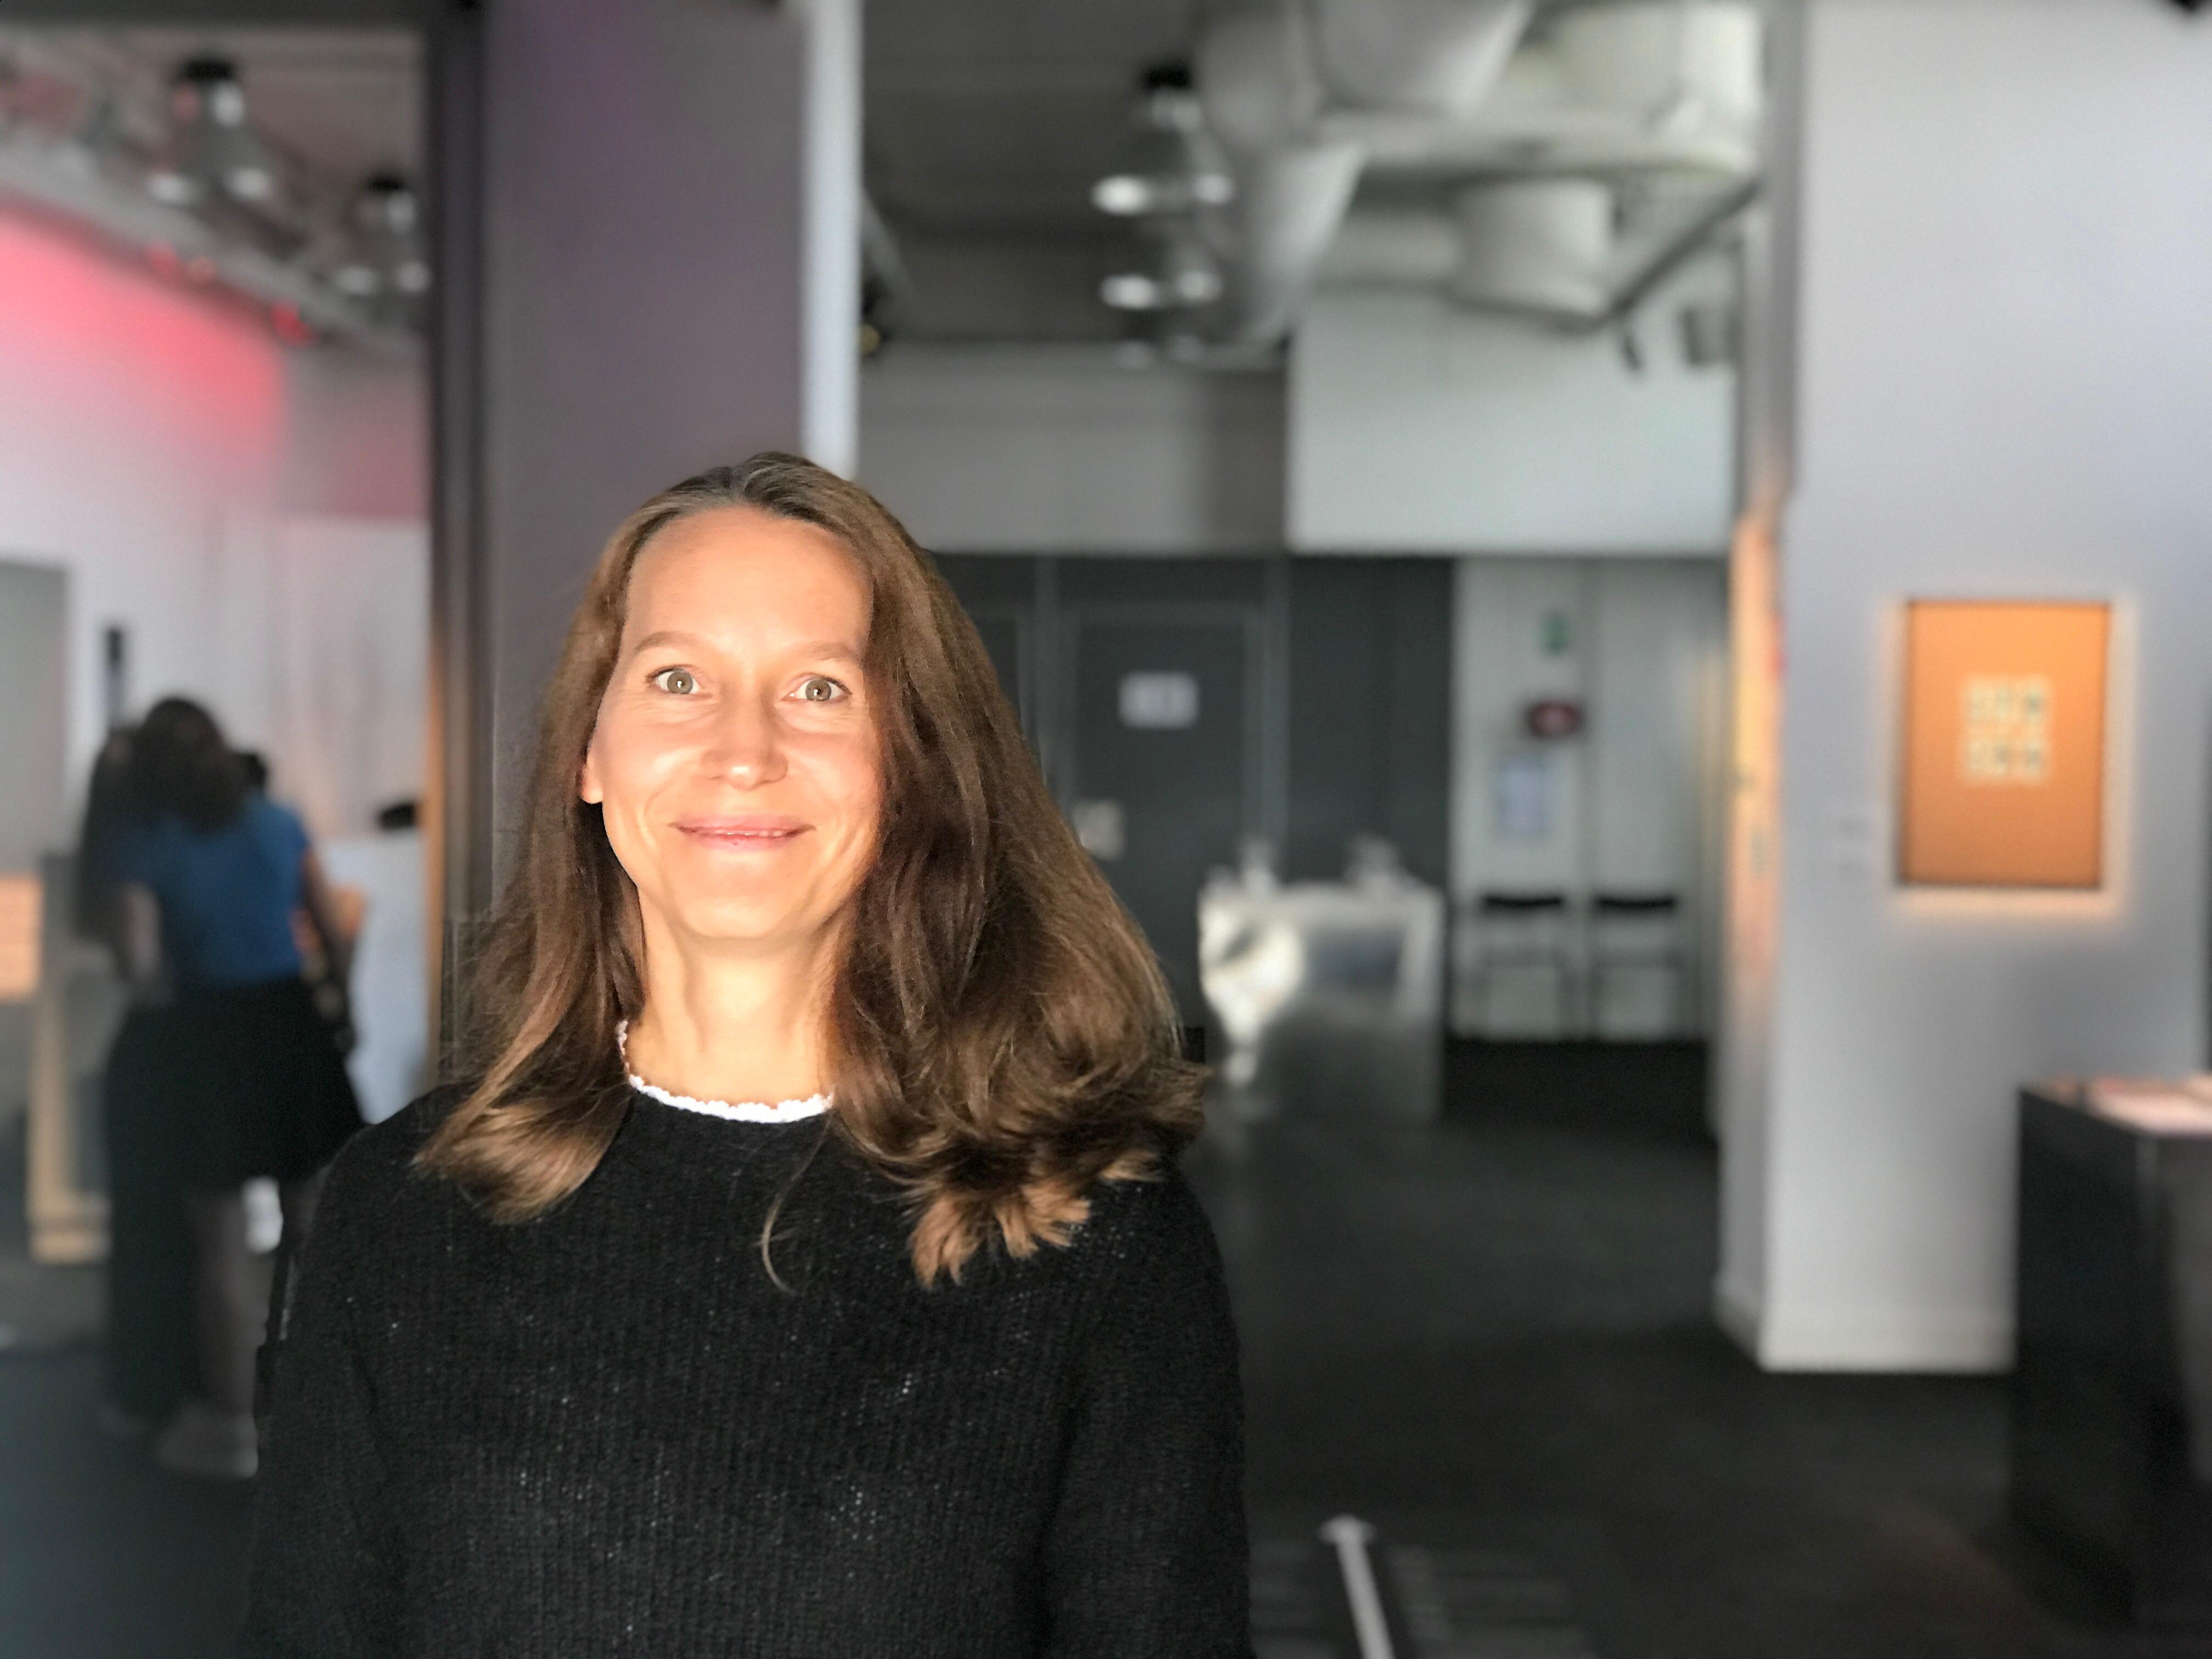 Susanna Hurtig, Nordenchef för InCharge